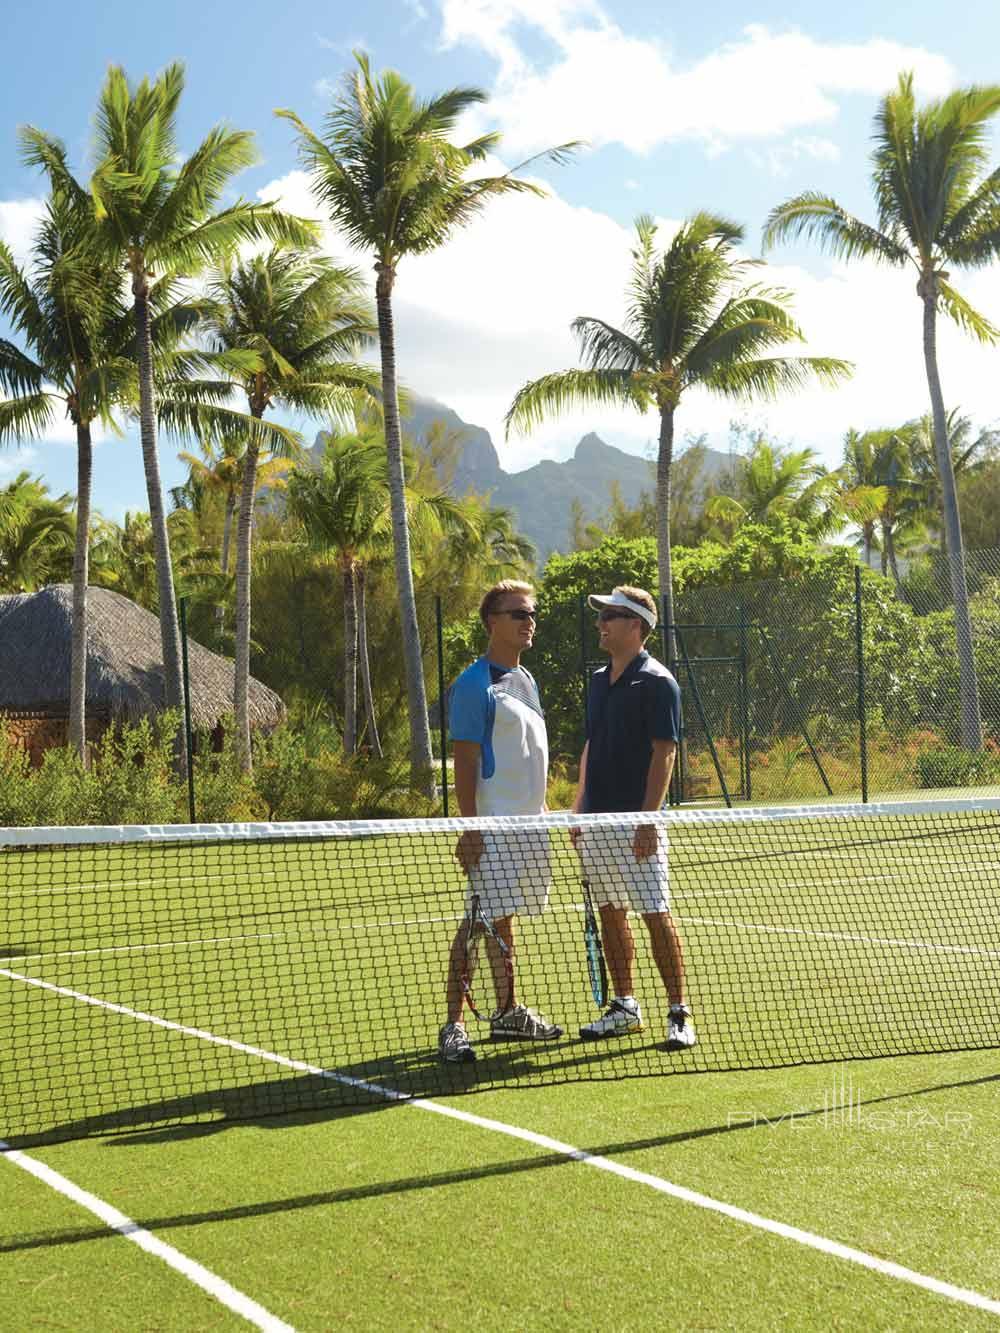 Tennis at Four Seasons Resort Bora BoraFrench Polynesia